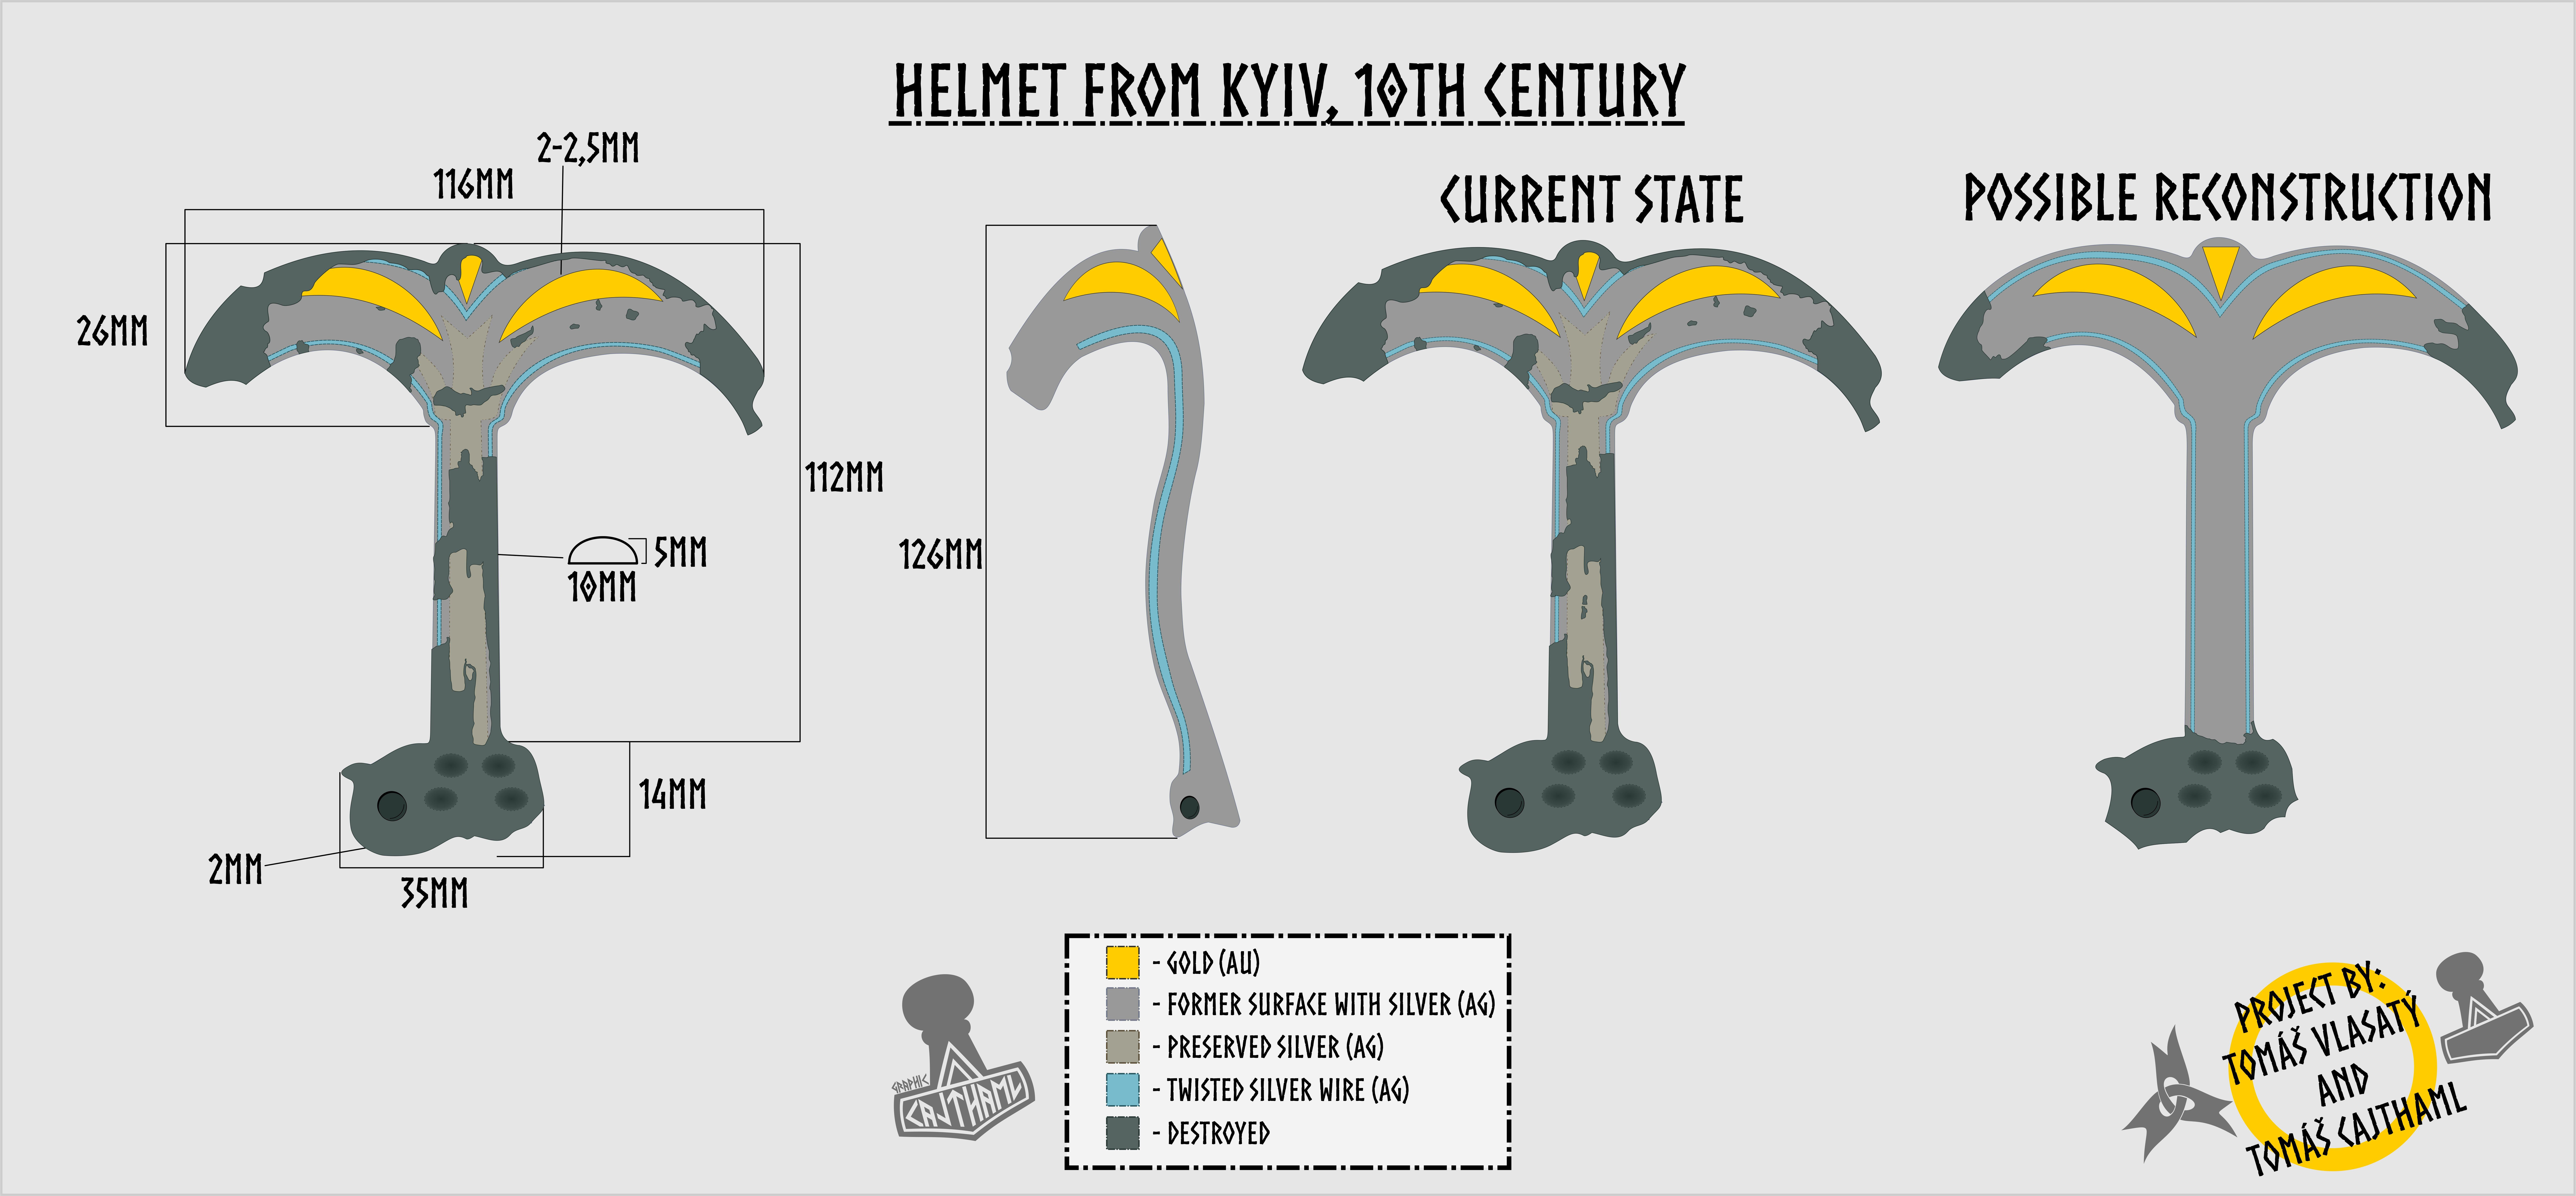 Helmet from Kyiv